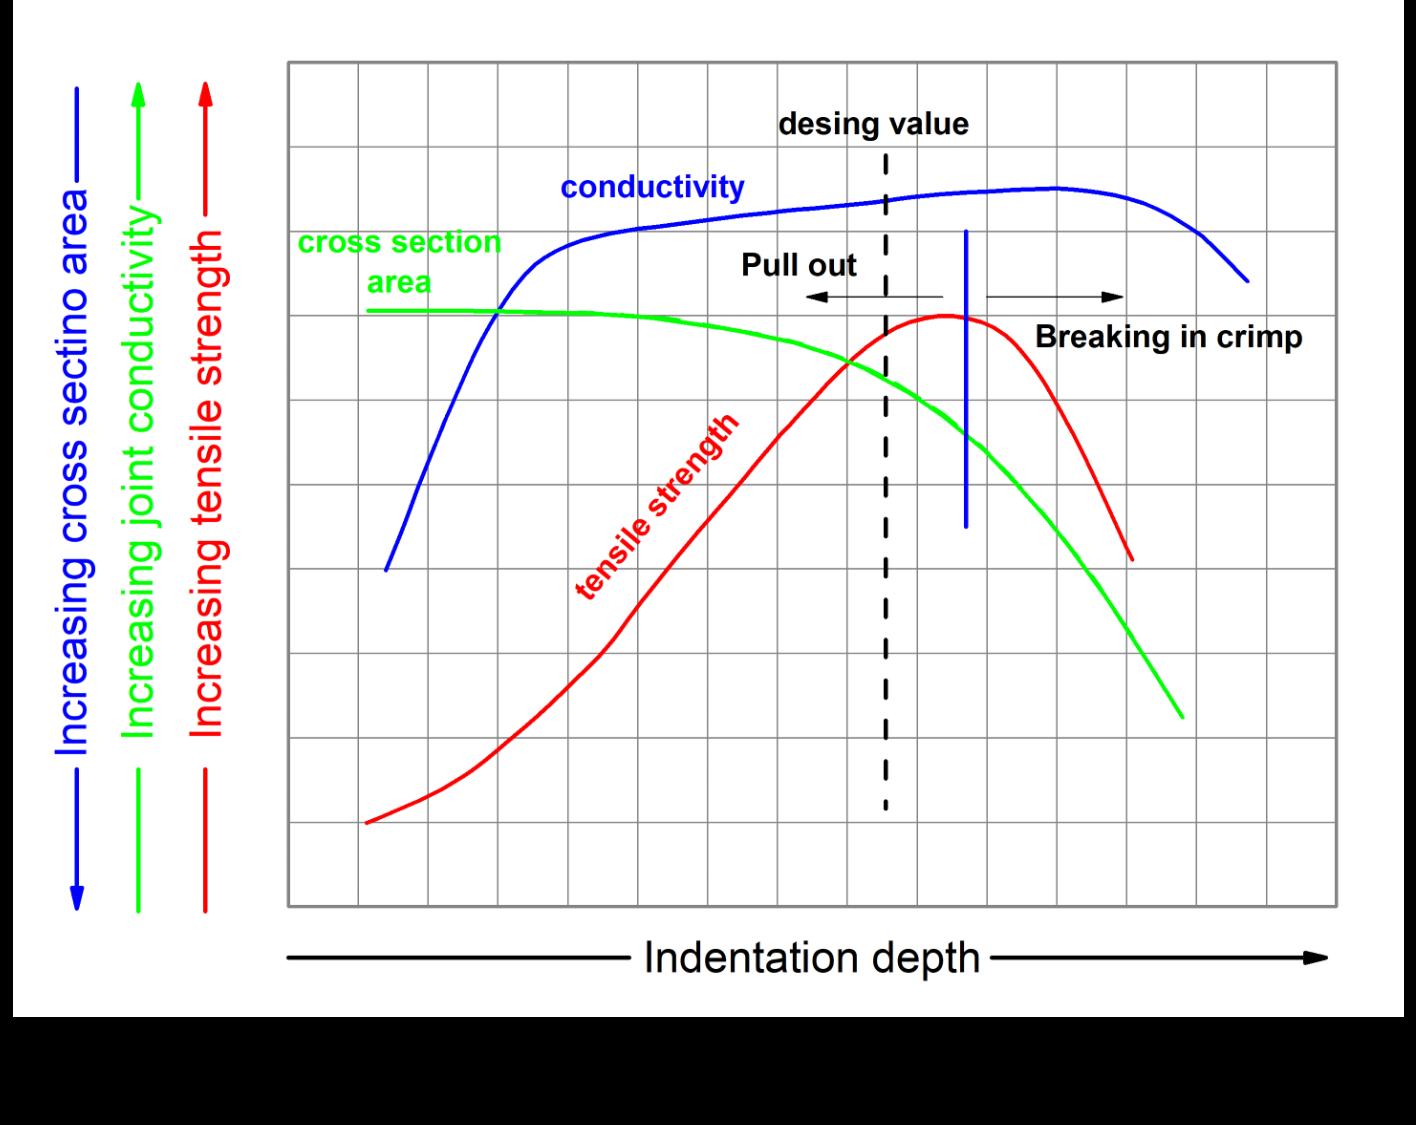 Improper degree of compression